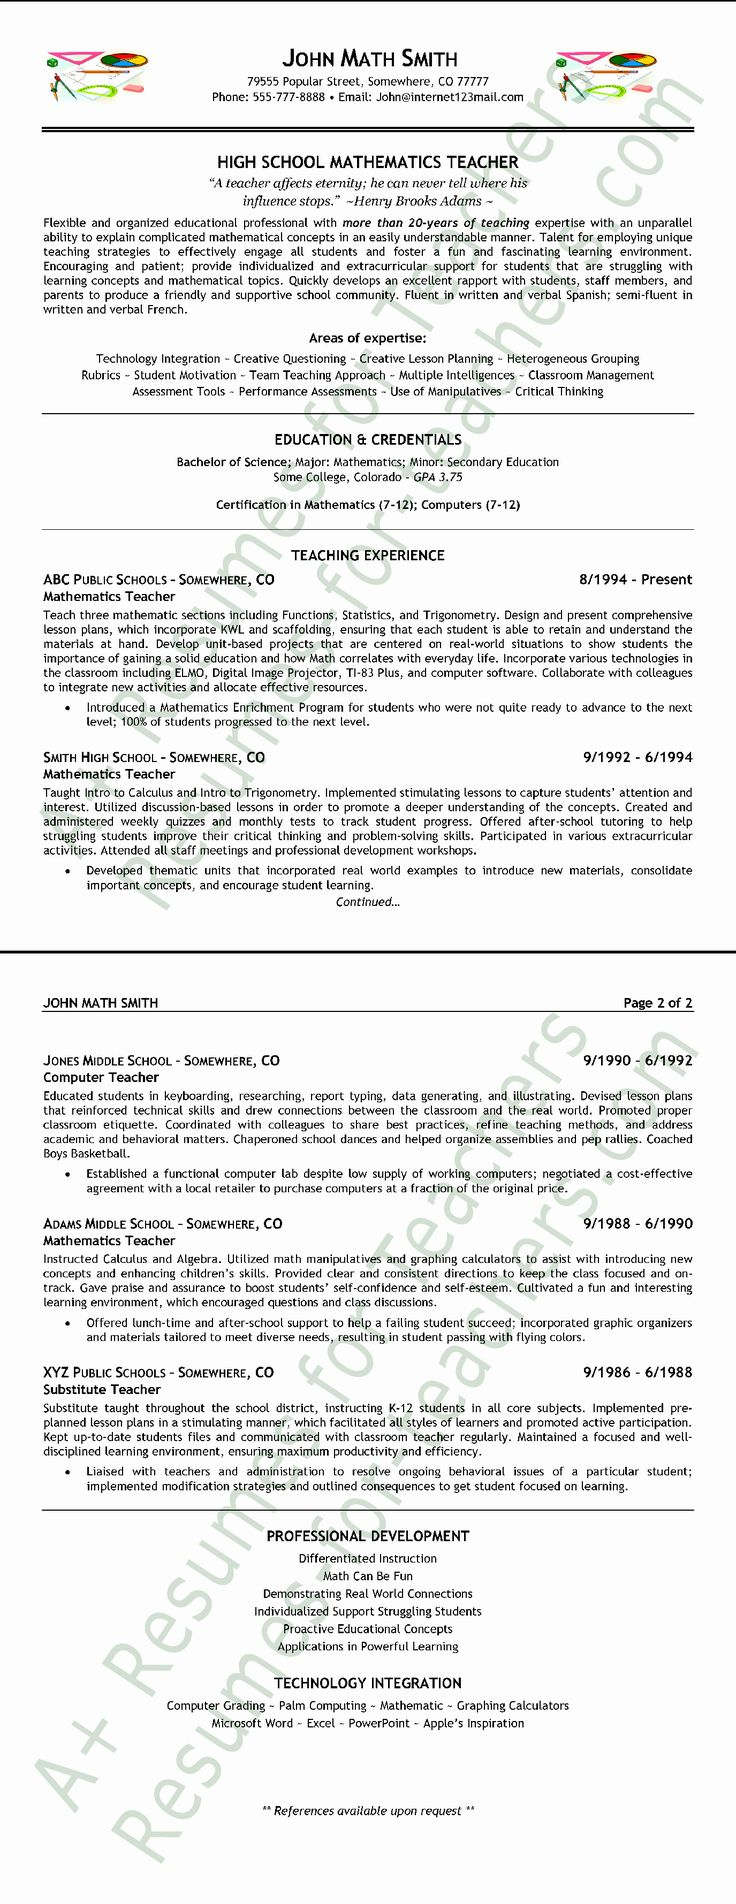 Resume Templates Wordpad Format in 2020 Teacher resume